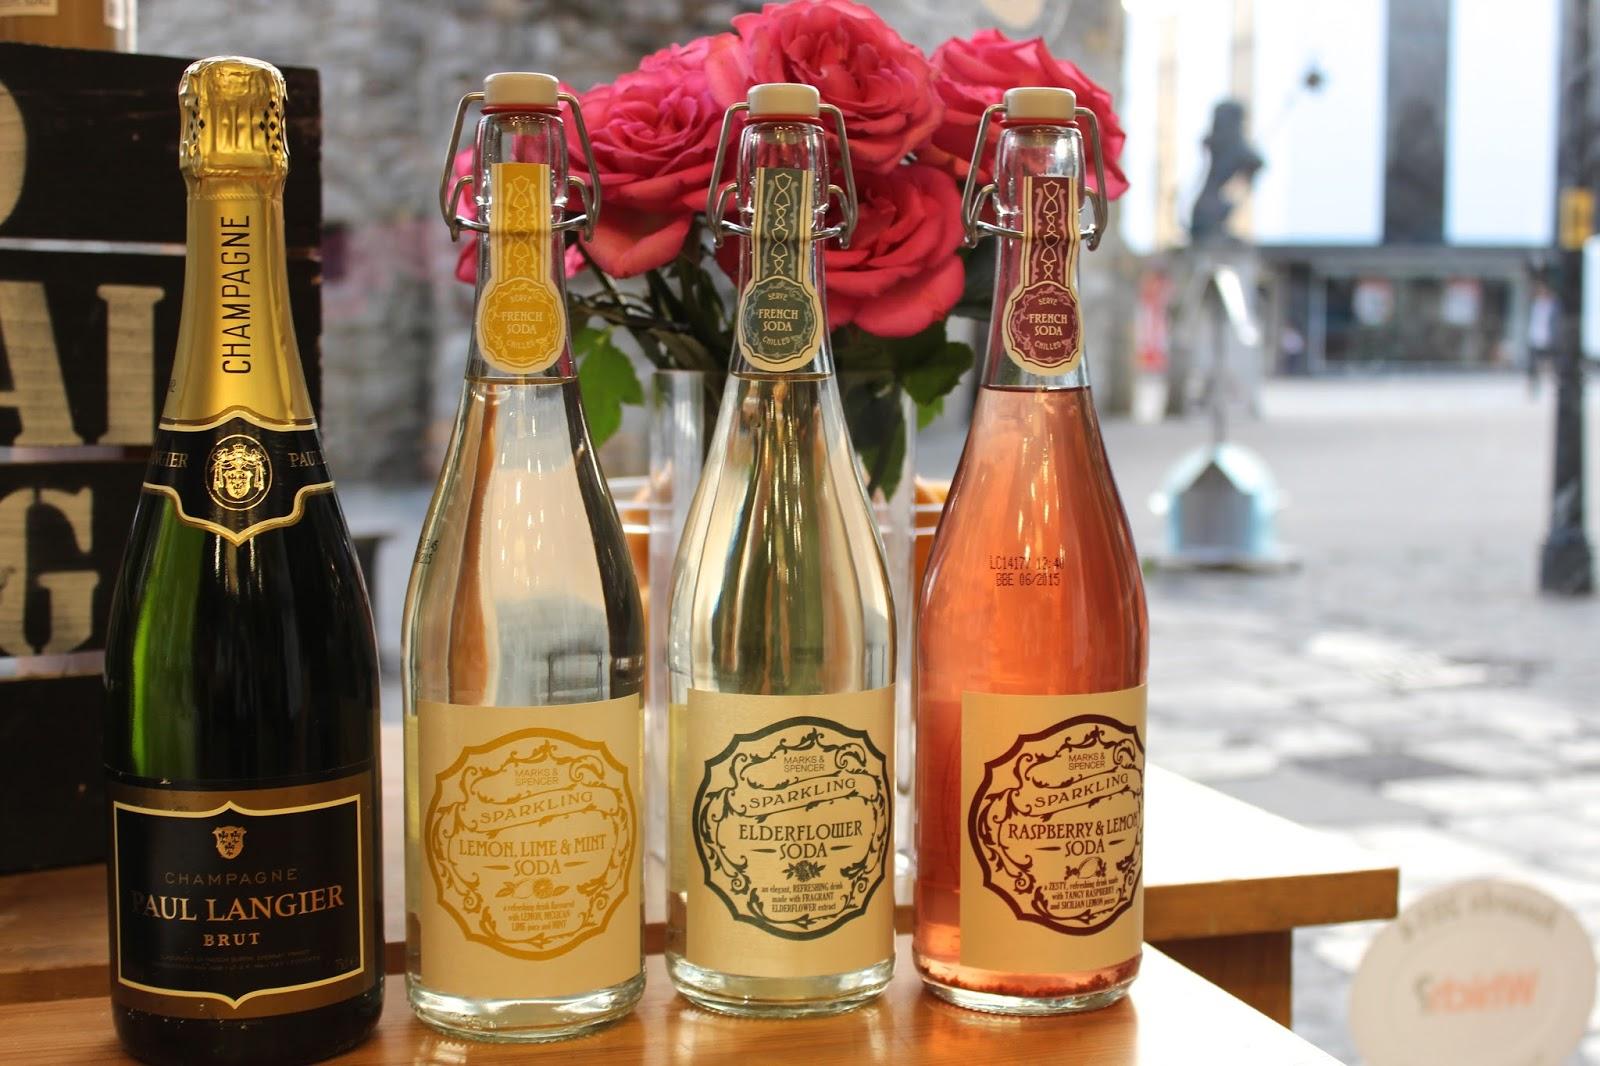 Champagne & Soda